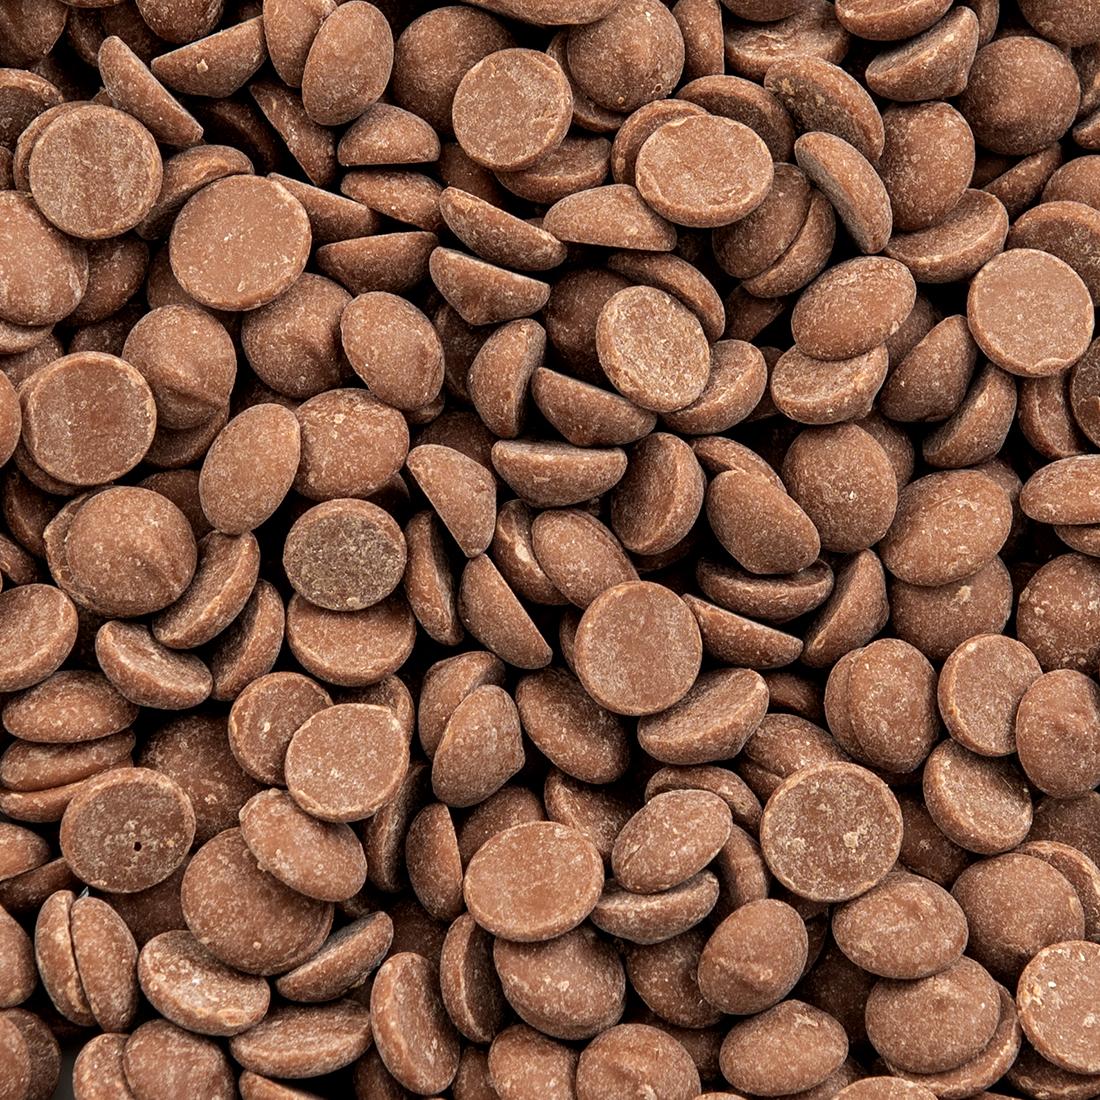 Melkchocolade druppels